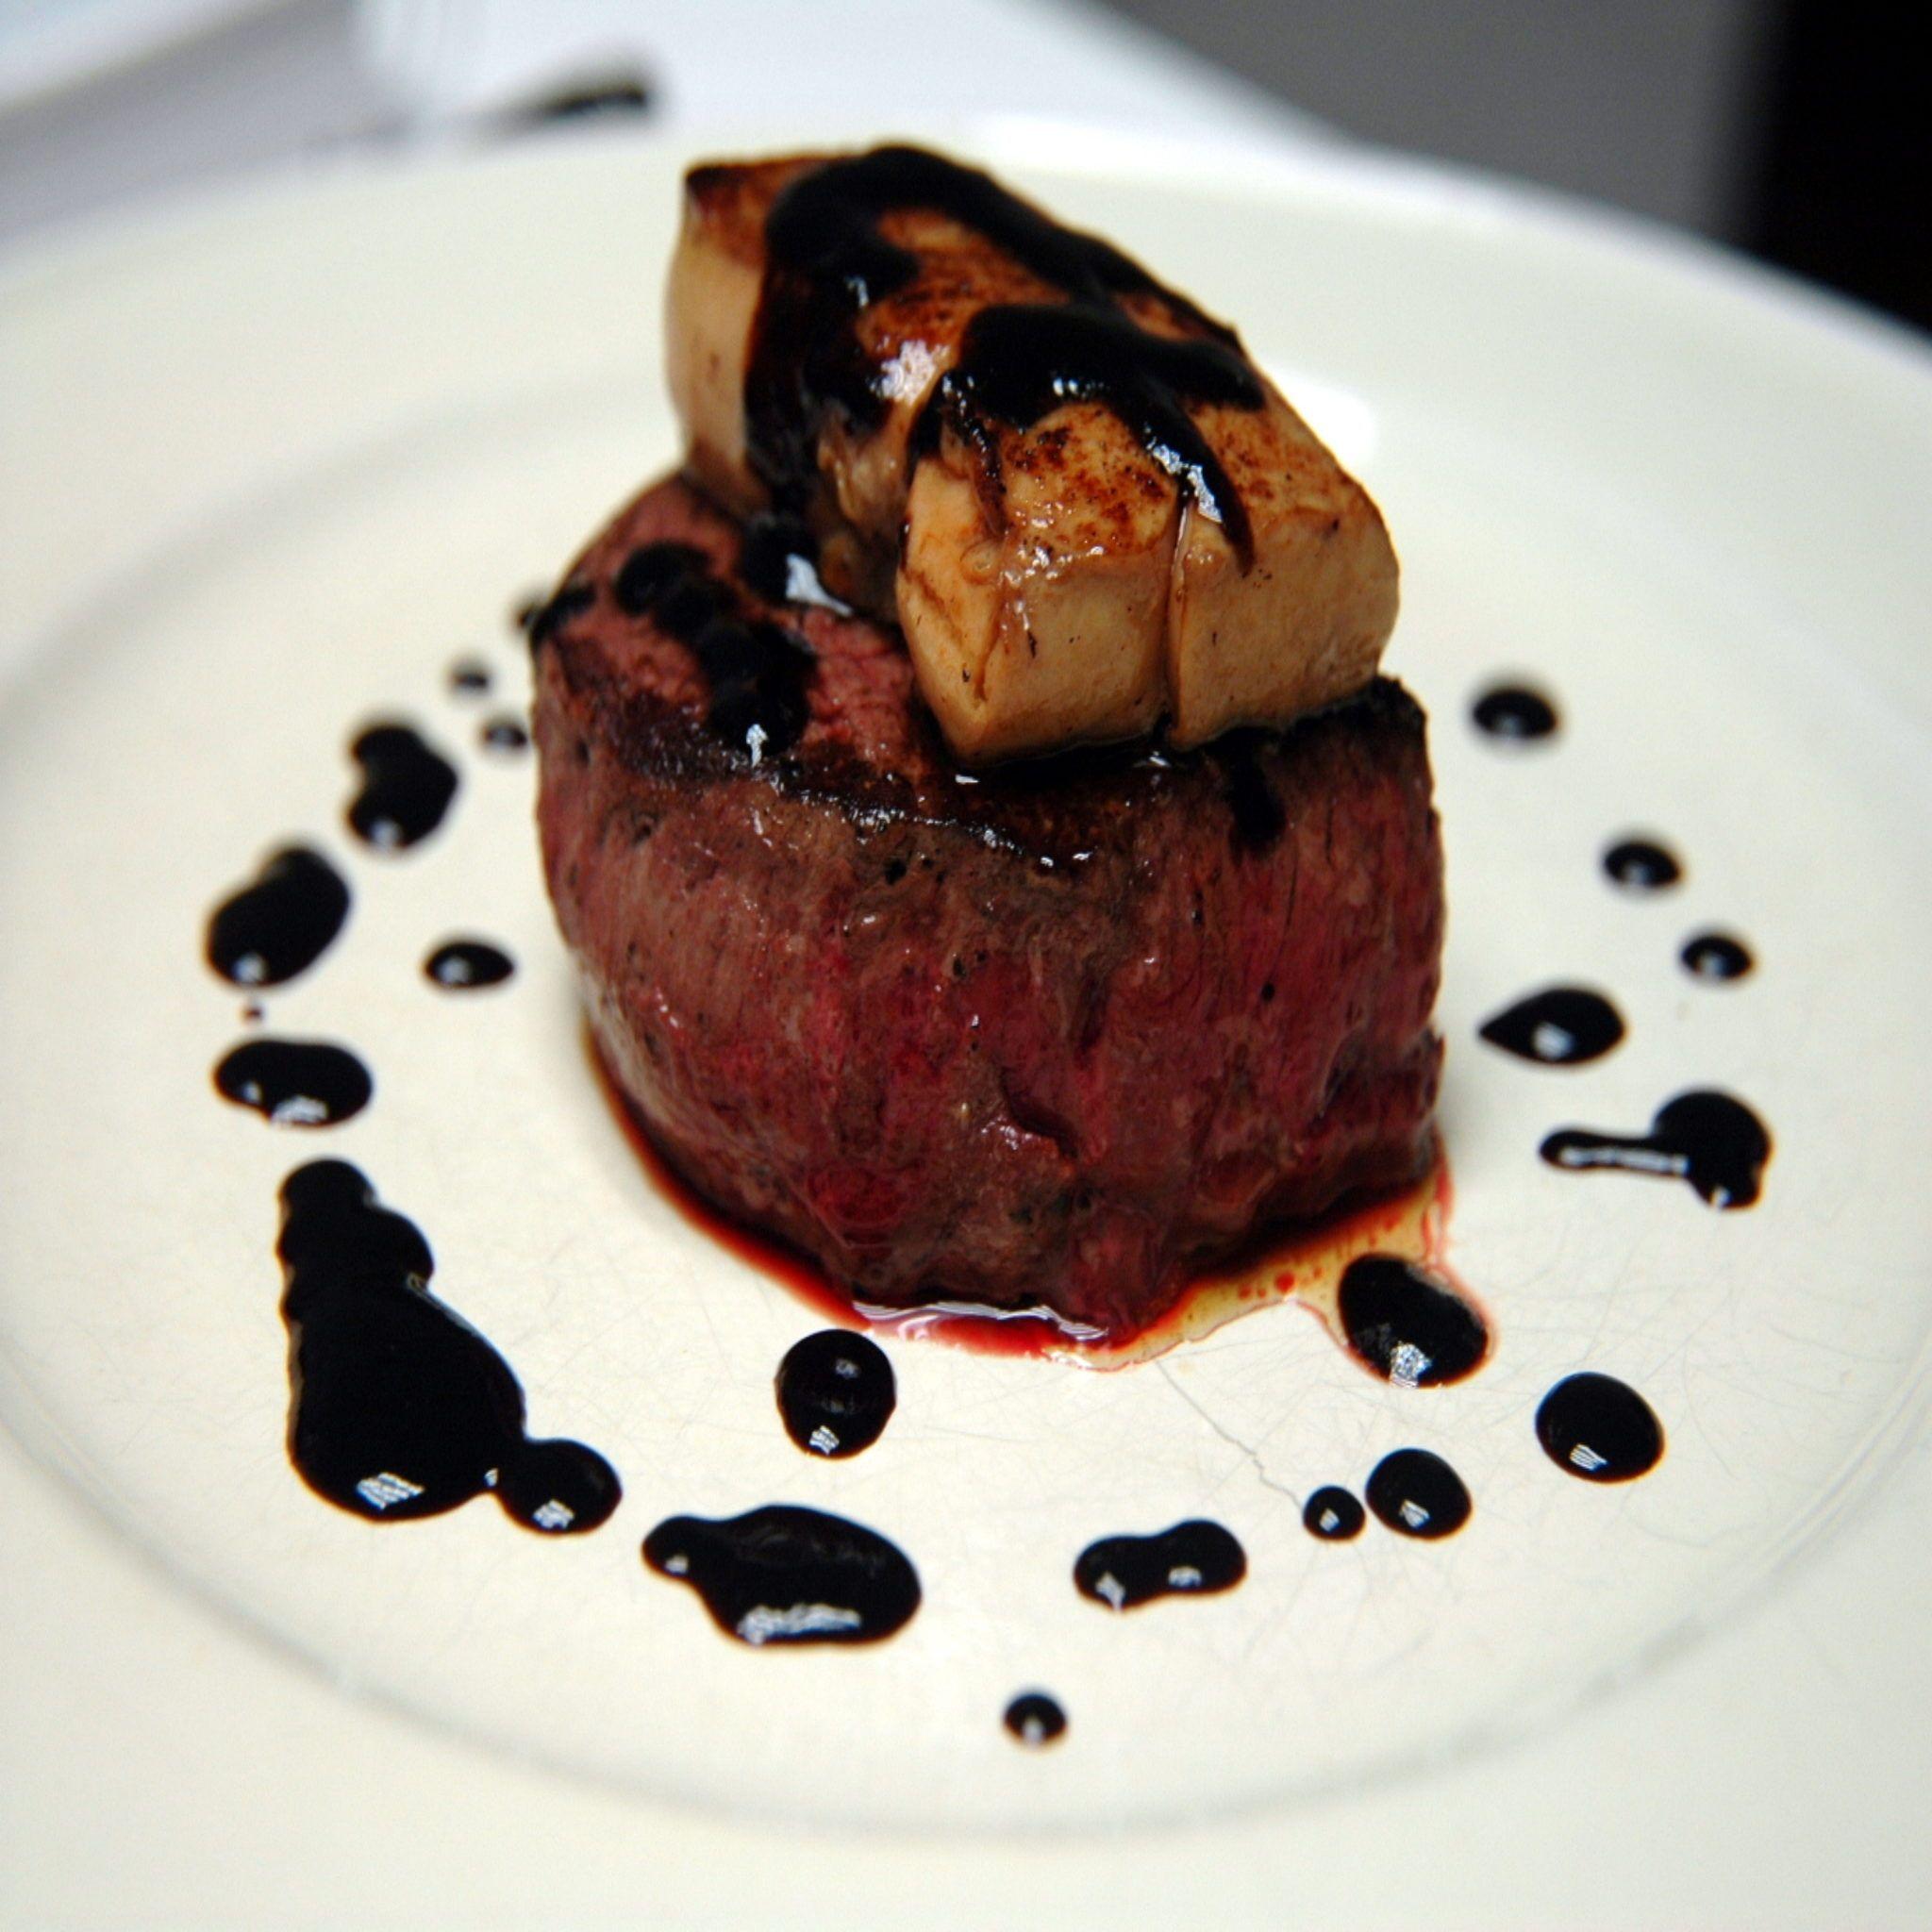 Filet Mignon With Seared Foie Gras And Blueberry Sauce Chloe Polemis Blueberry Sauce Filet Mignon Sauce Filet Mignon